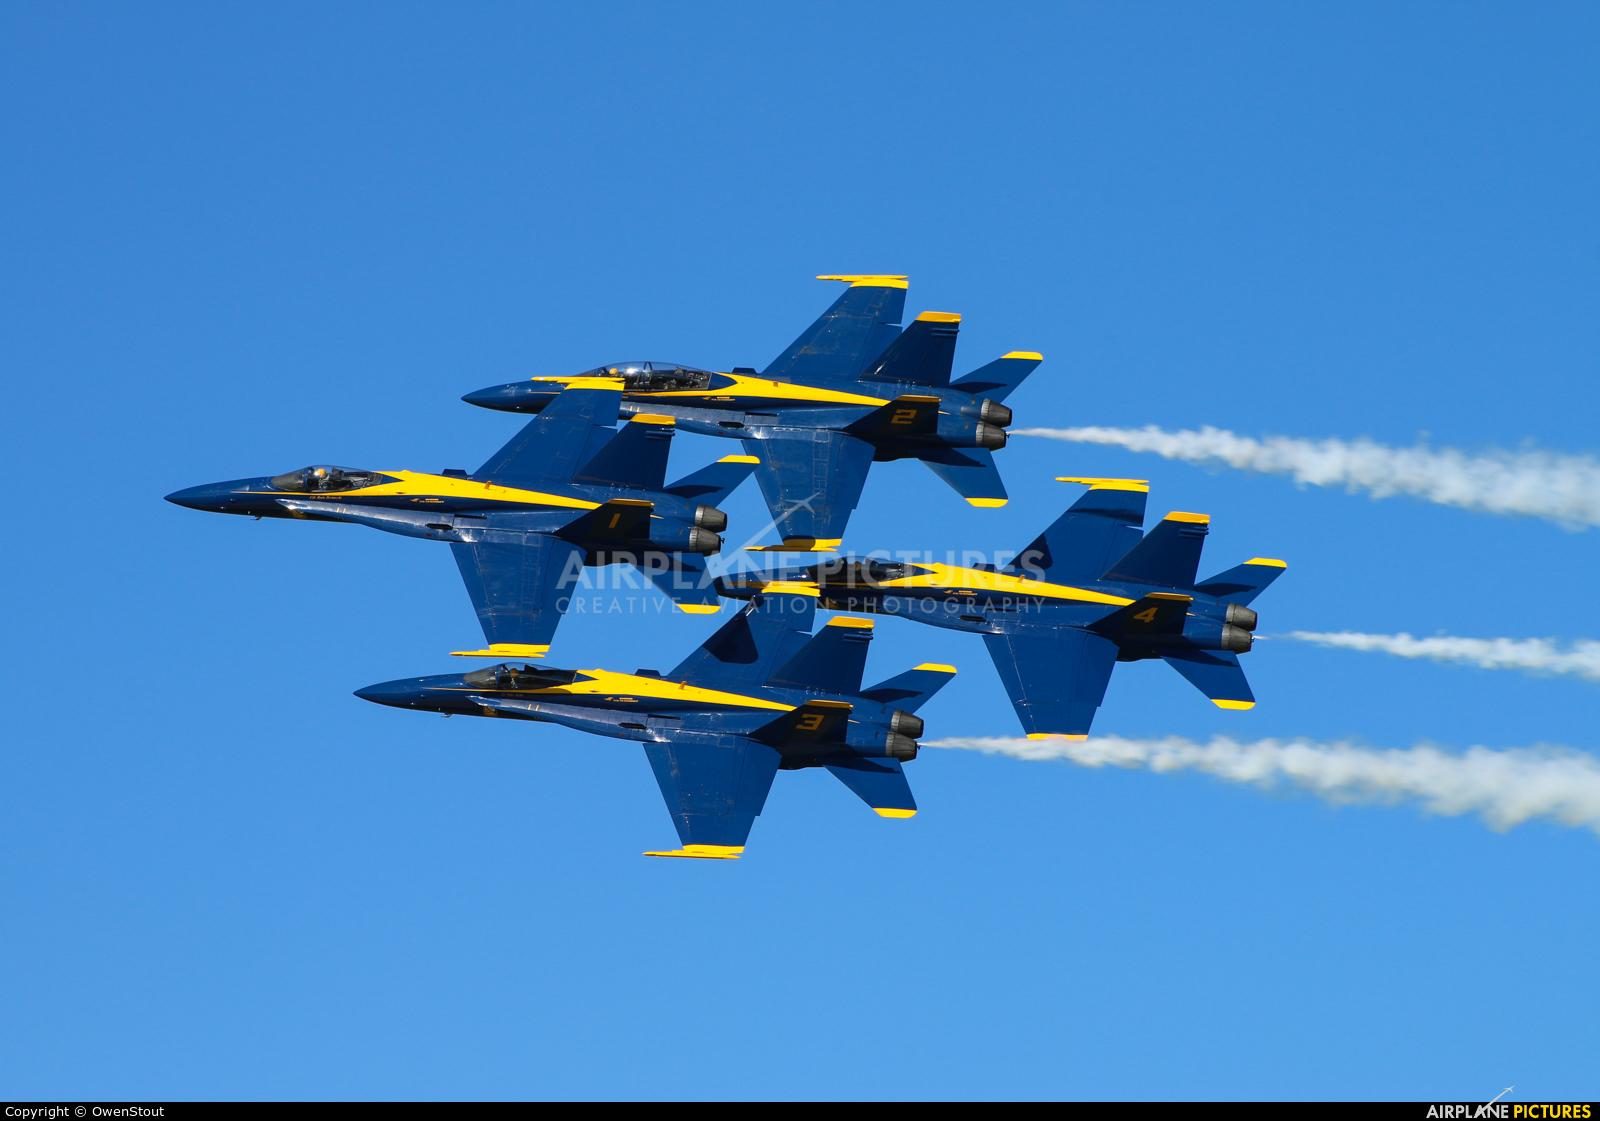 USA - Navy : Blue Angels - aircraft at Oshkosh - Wittman Regional